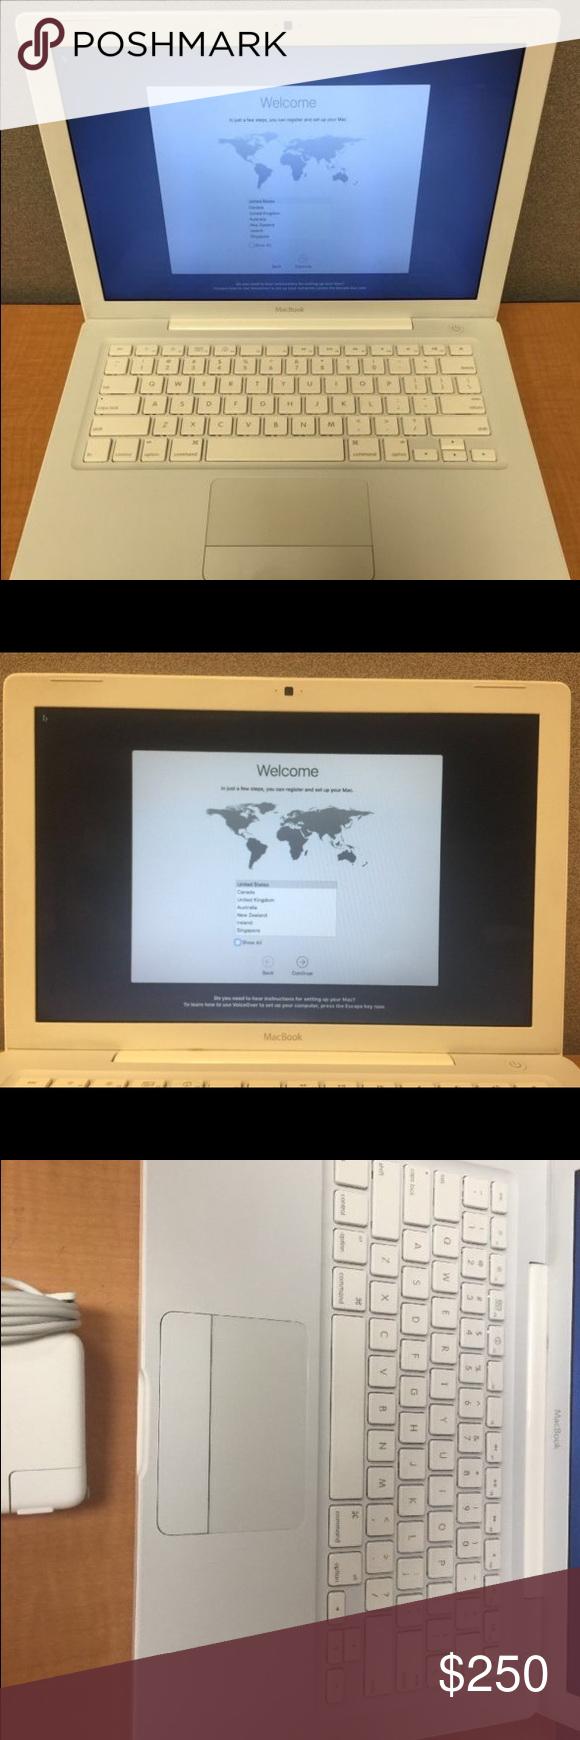 "APPLE MACBOOK Apple MacBook 5.2 13.3"" 2.13GHZ 4GB RAM"